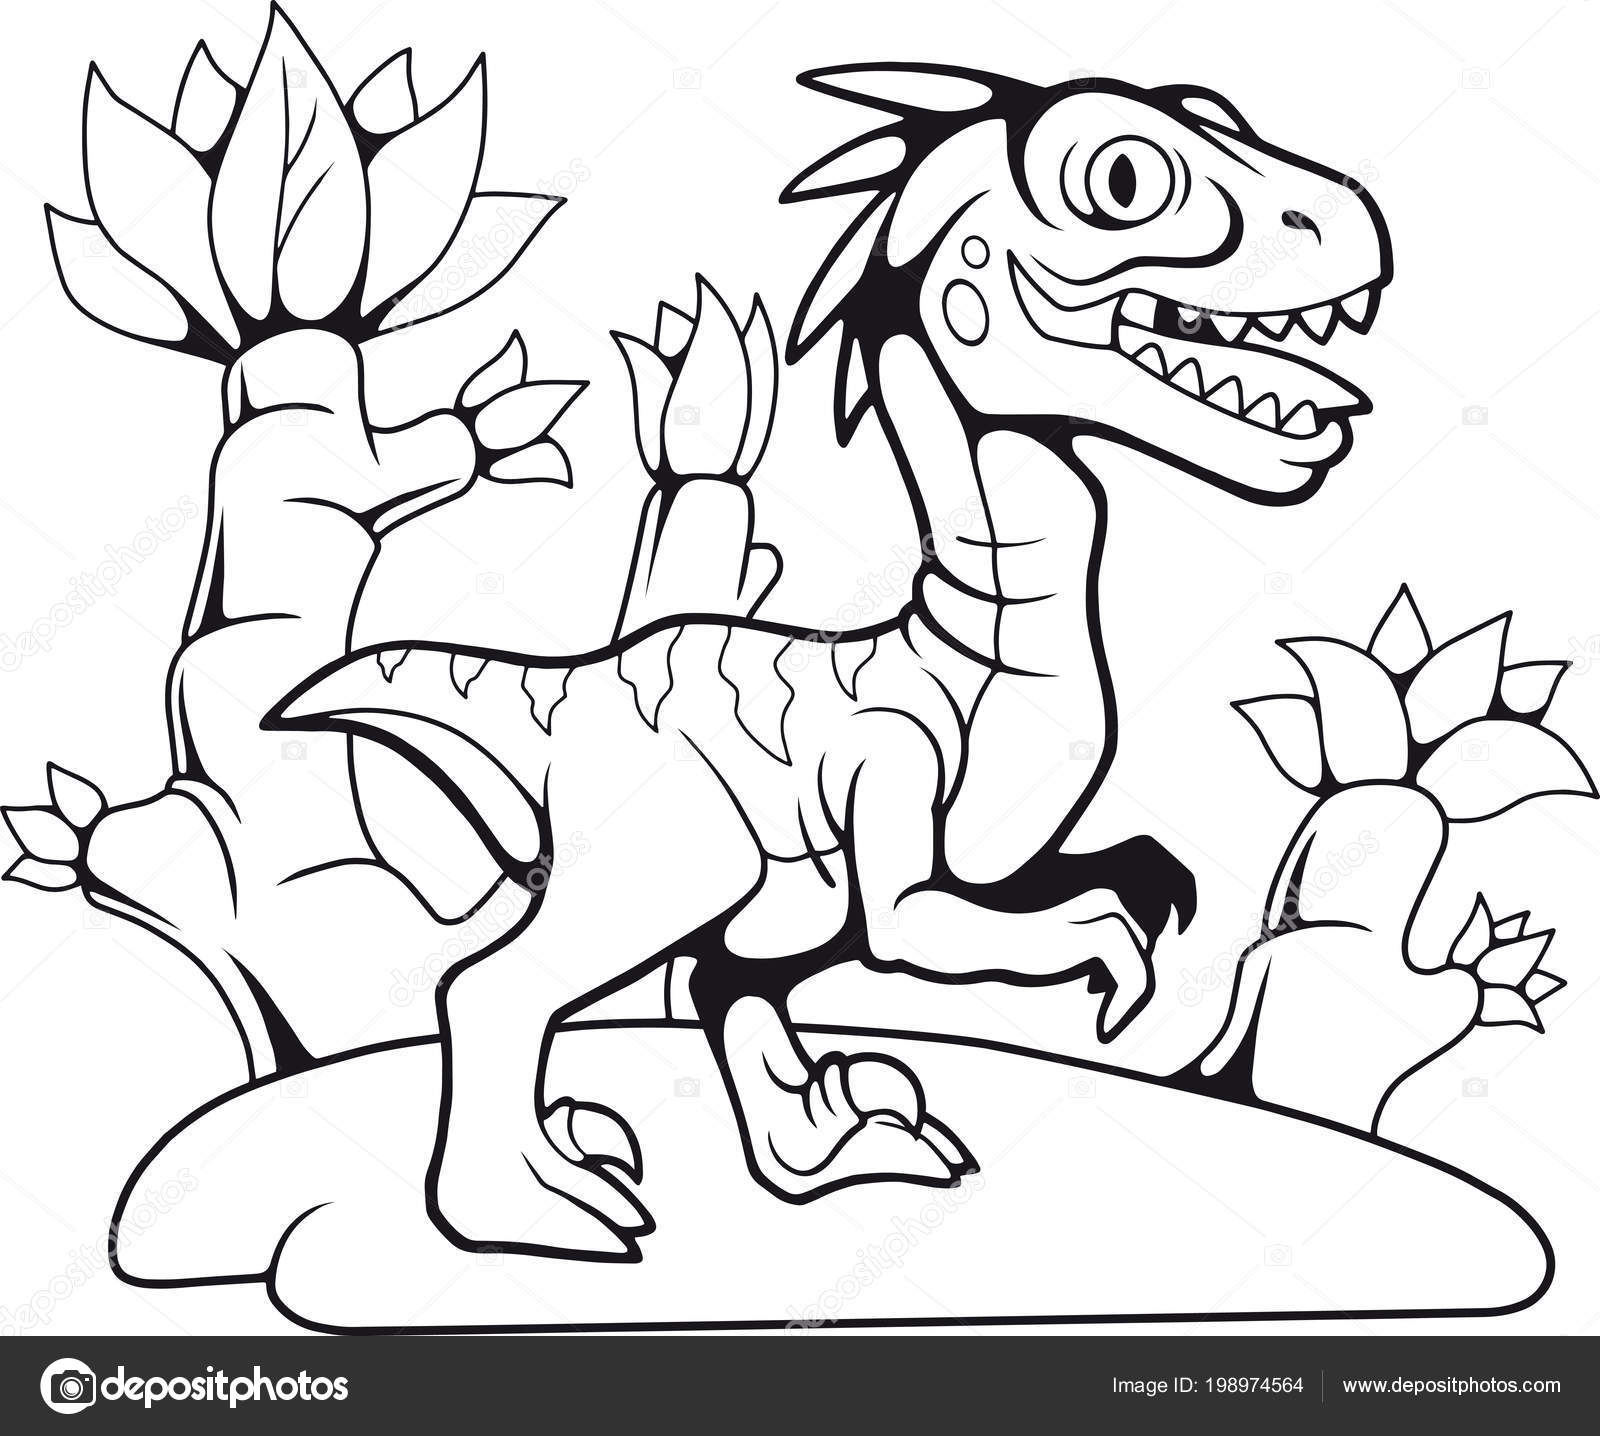 Dibujos Animados Divertida Prehistórico Velociraptor Dibujo Contorno ...